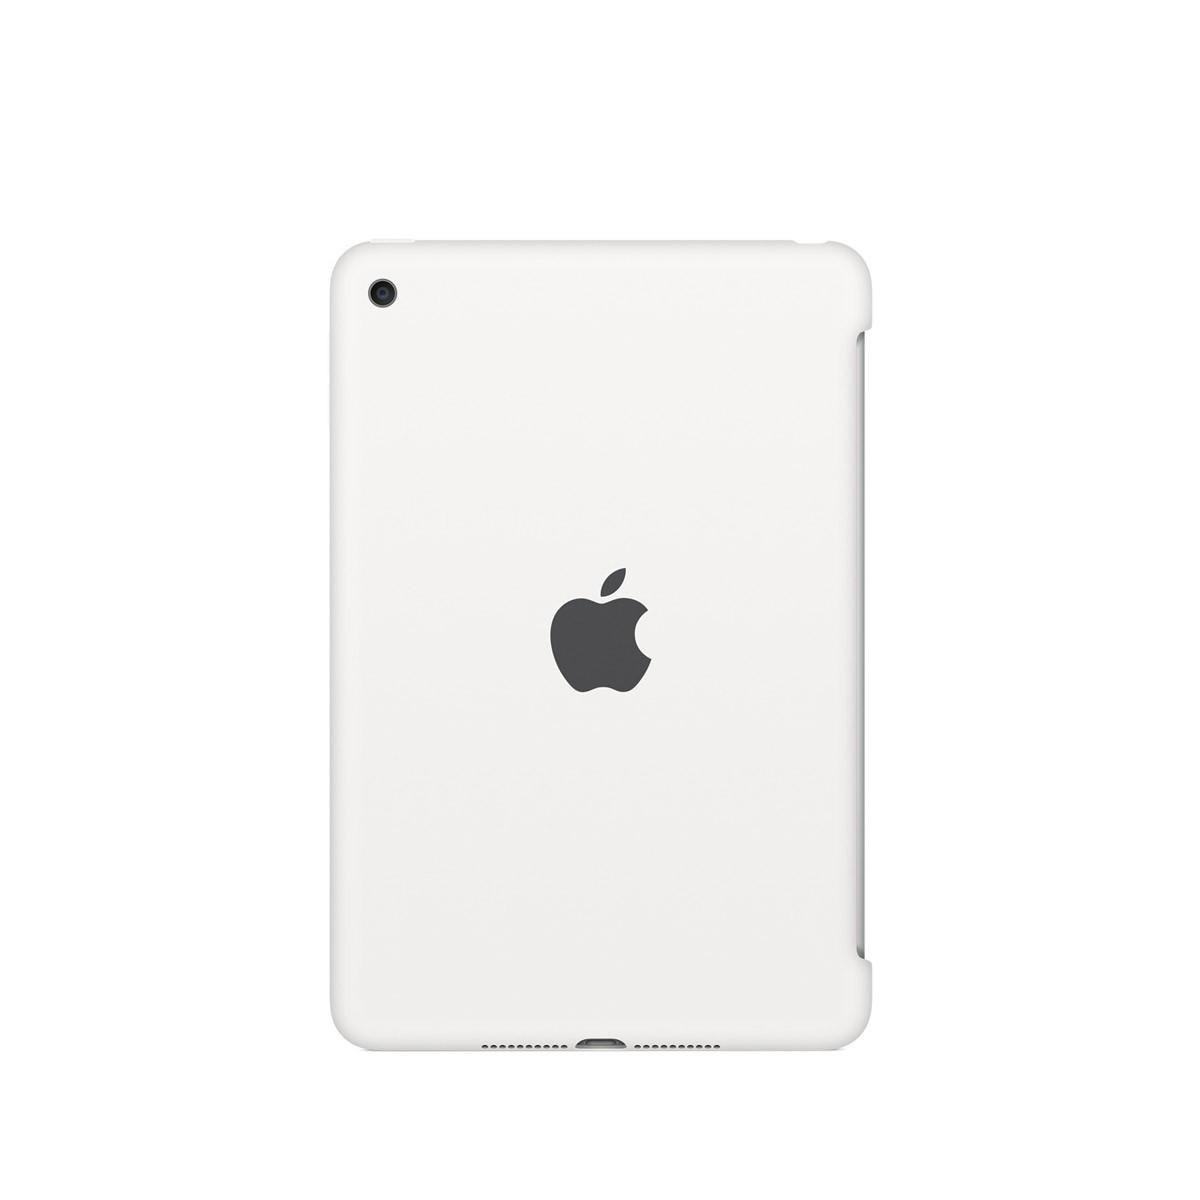 Apple Silikonové pouzdro na iPad mini 4 – bílé mkll2zm/a